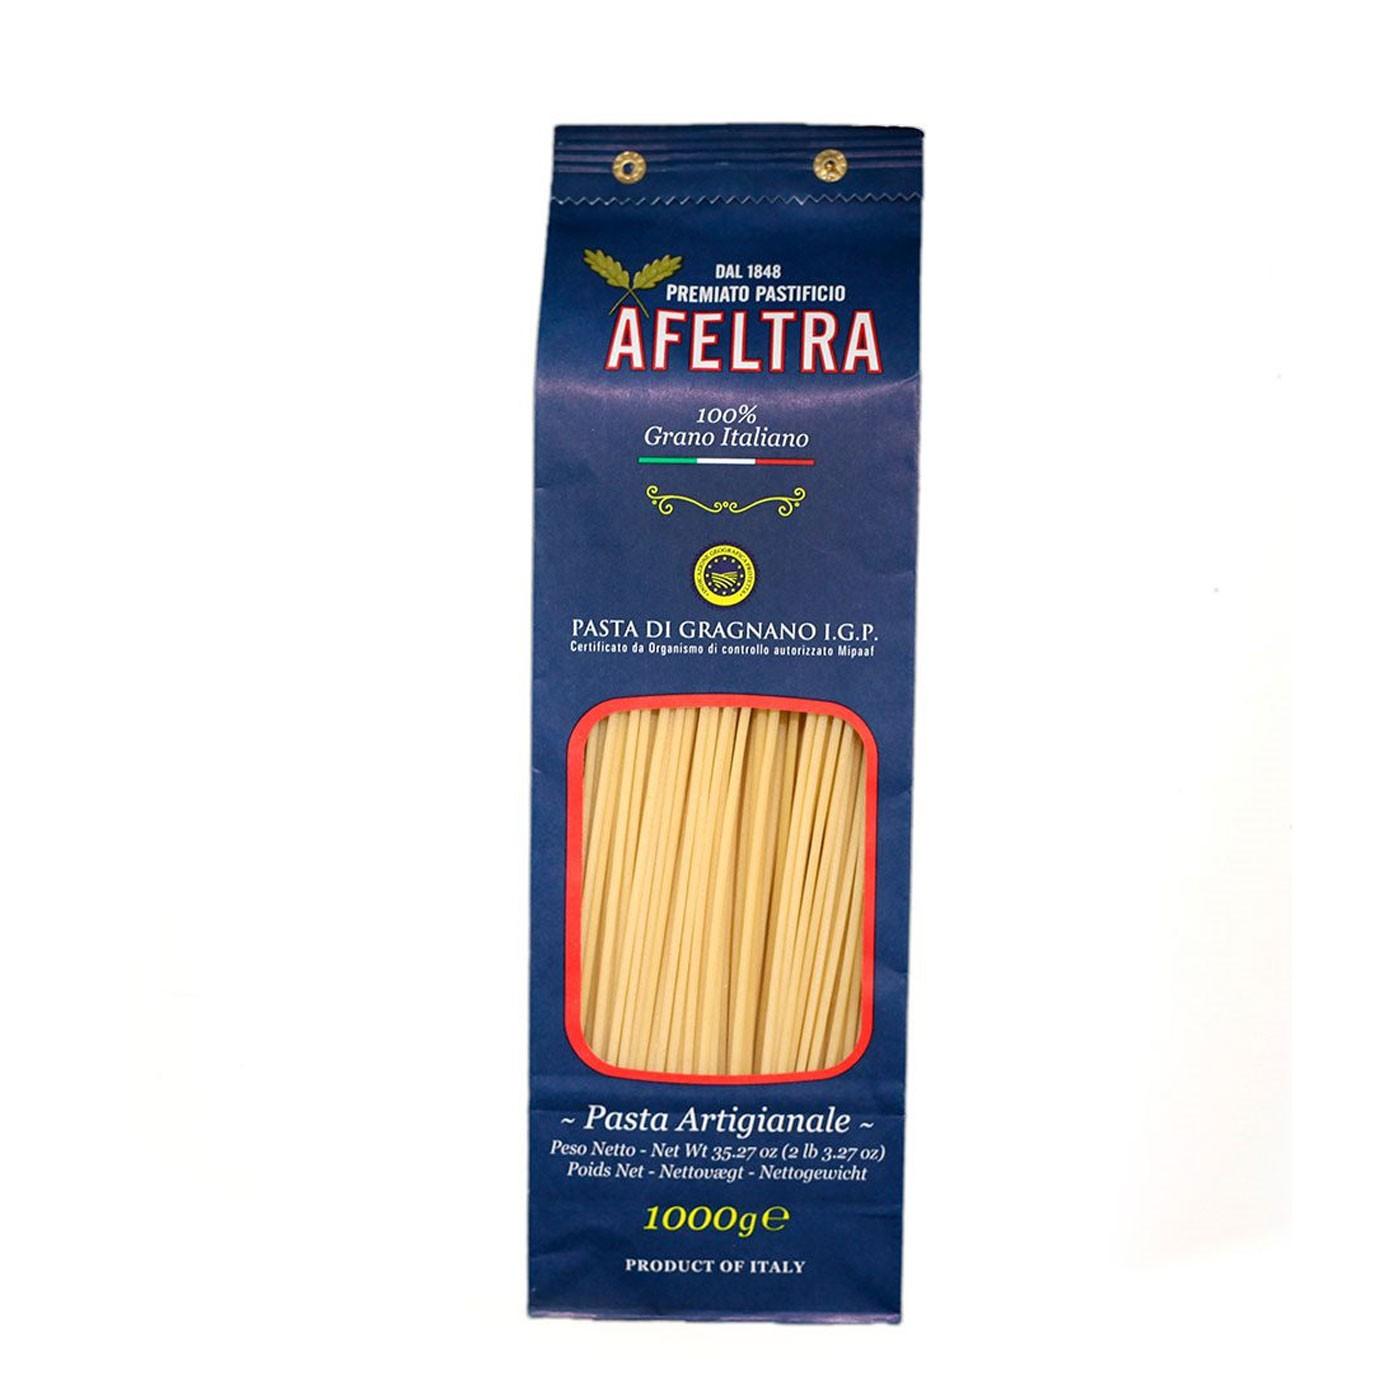 100% Italian Grain Bucatini 35.3 oz